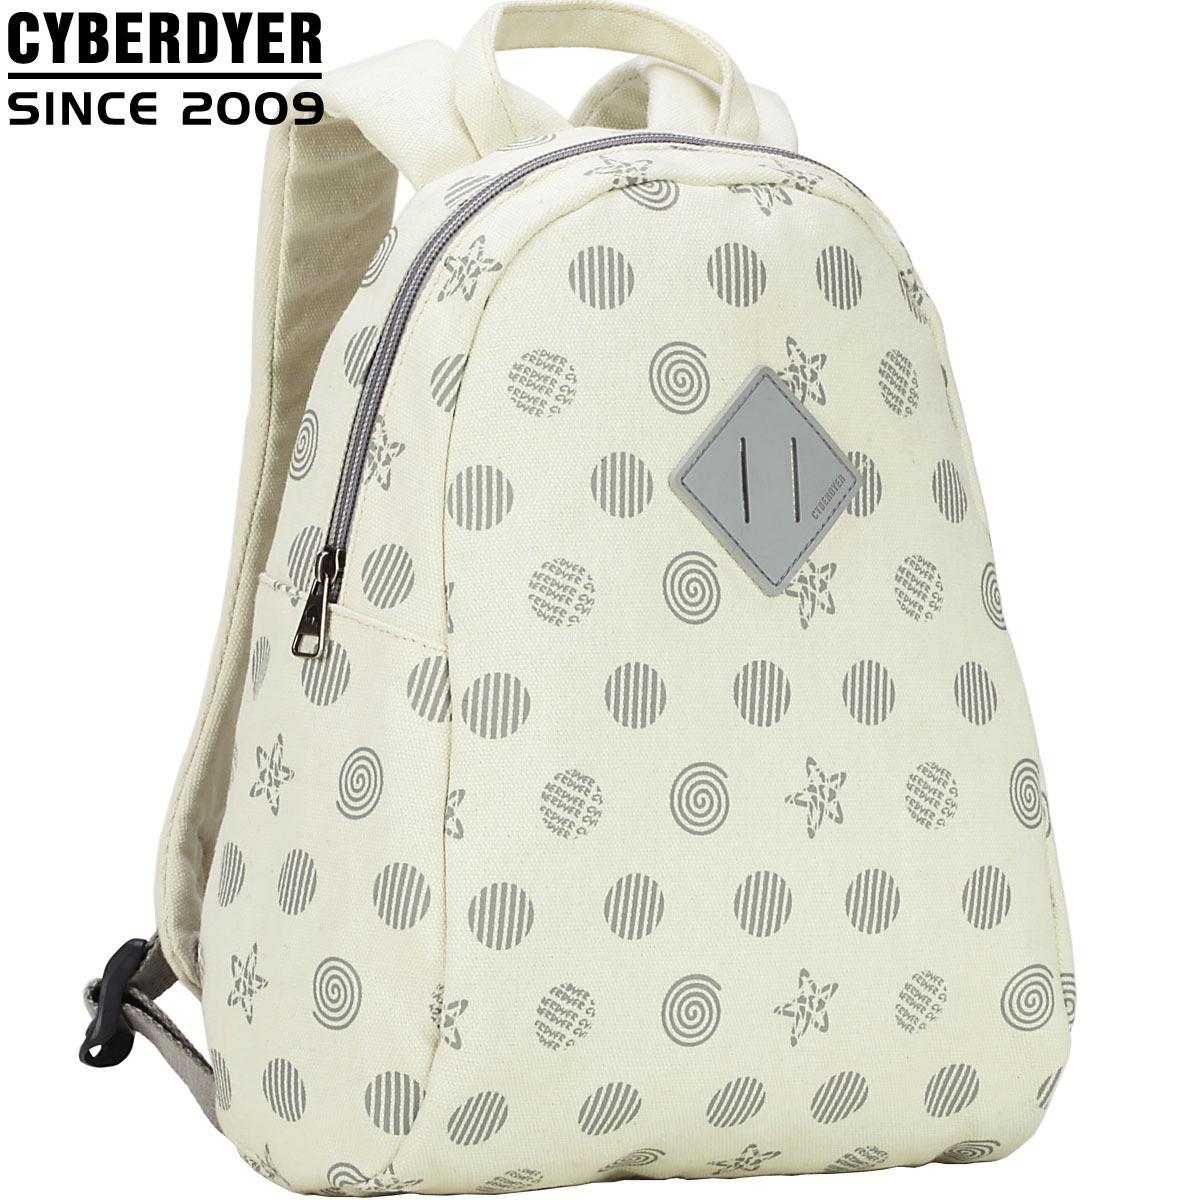 free shipping women's casual backpack bag canvas bag female bag cheap school bag(China (Mainland))